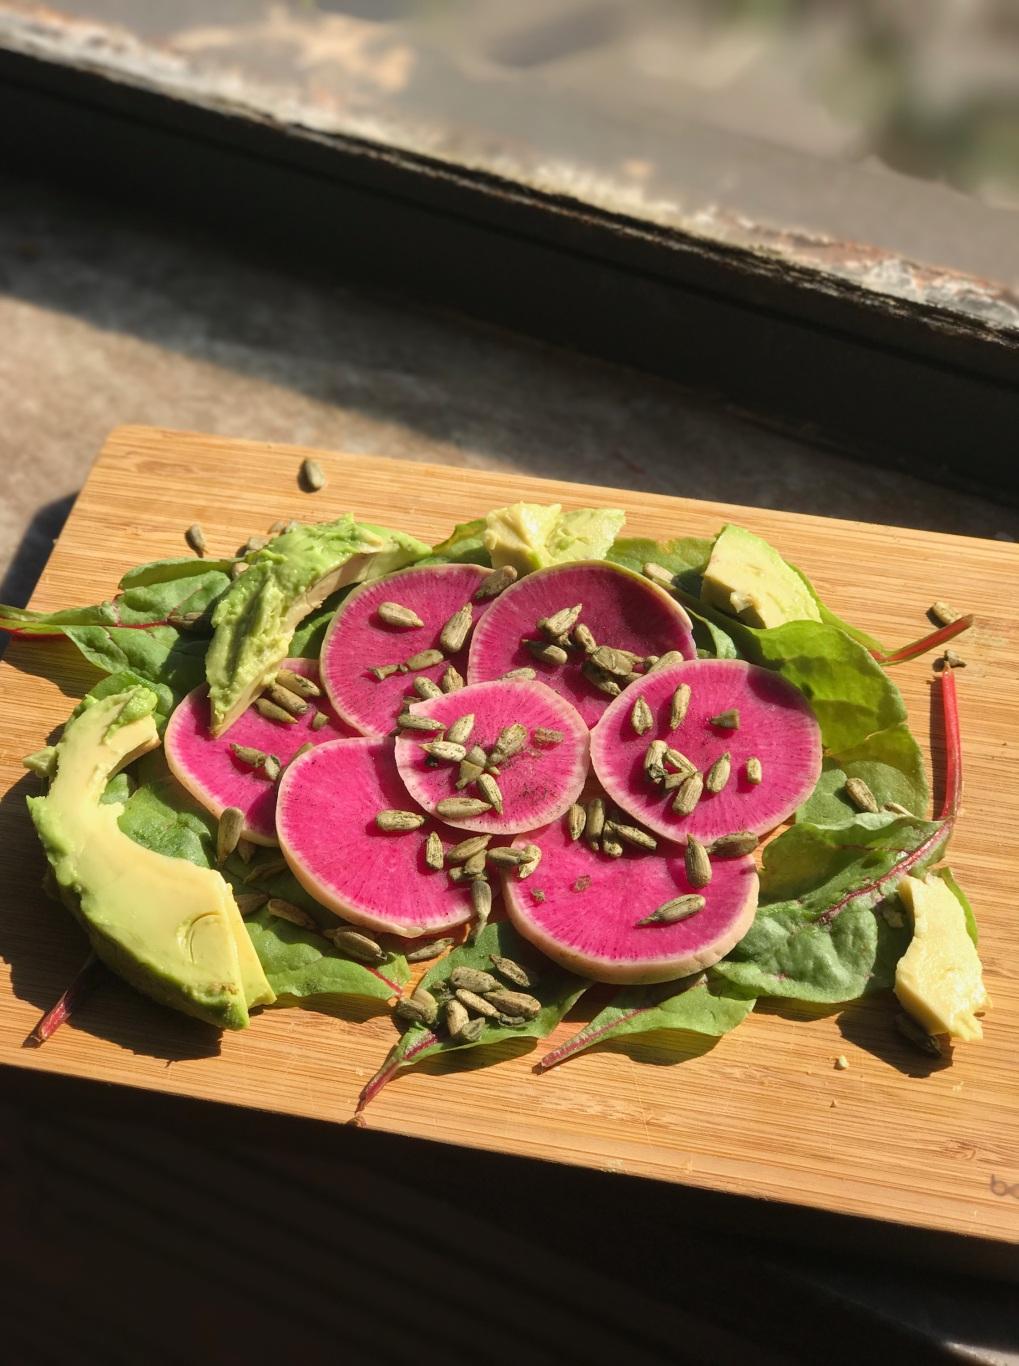 Watermelon Radish Salad With Avocado